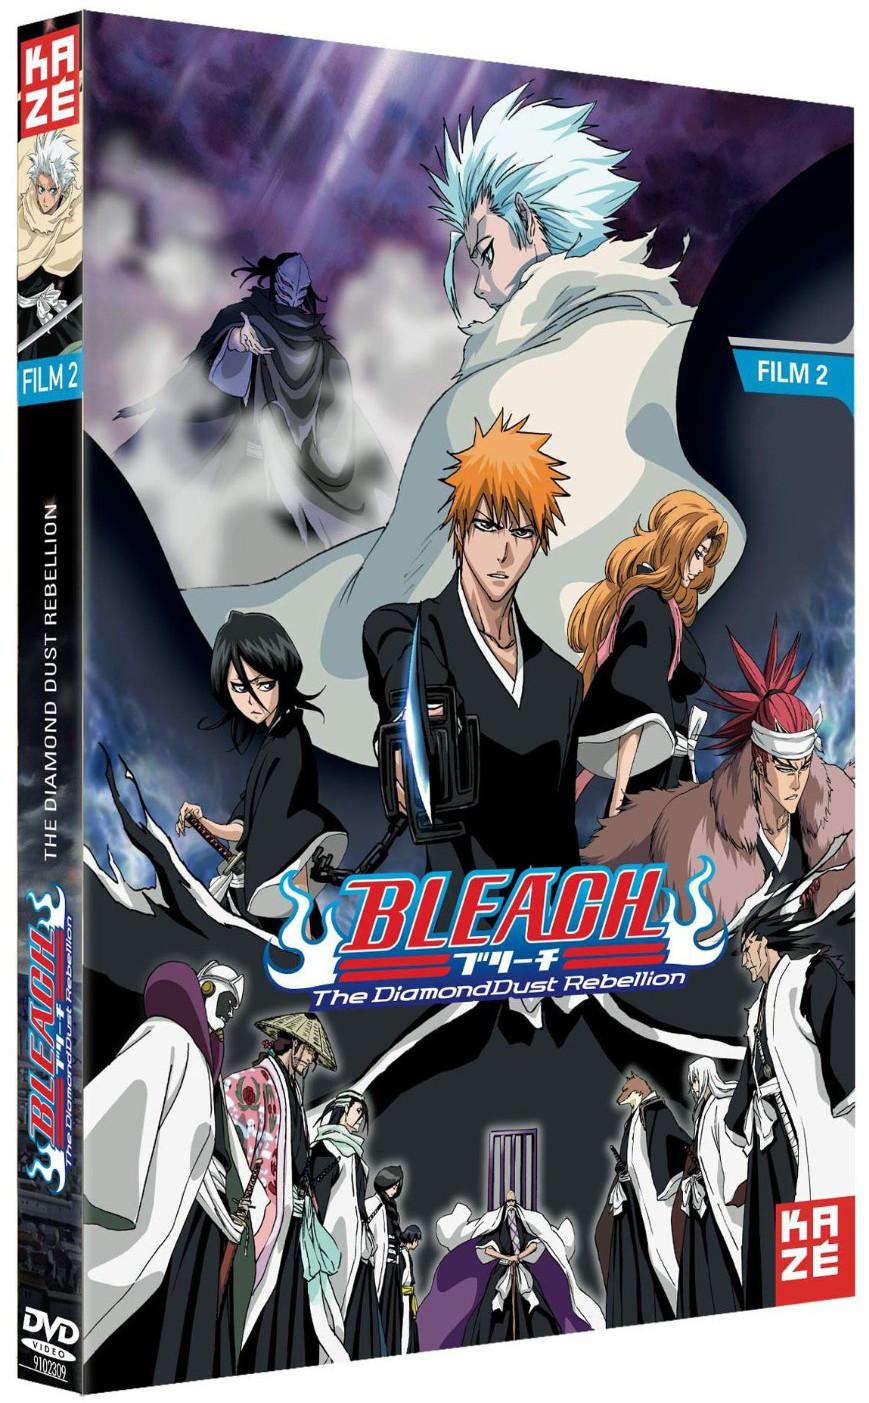 Bleach - Film 2 - The Diamond Dust Rebellion 1